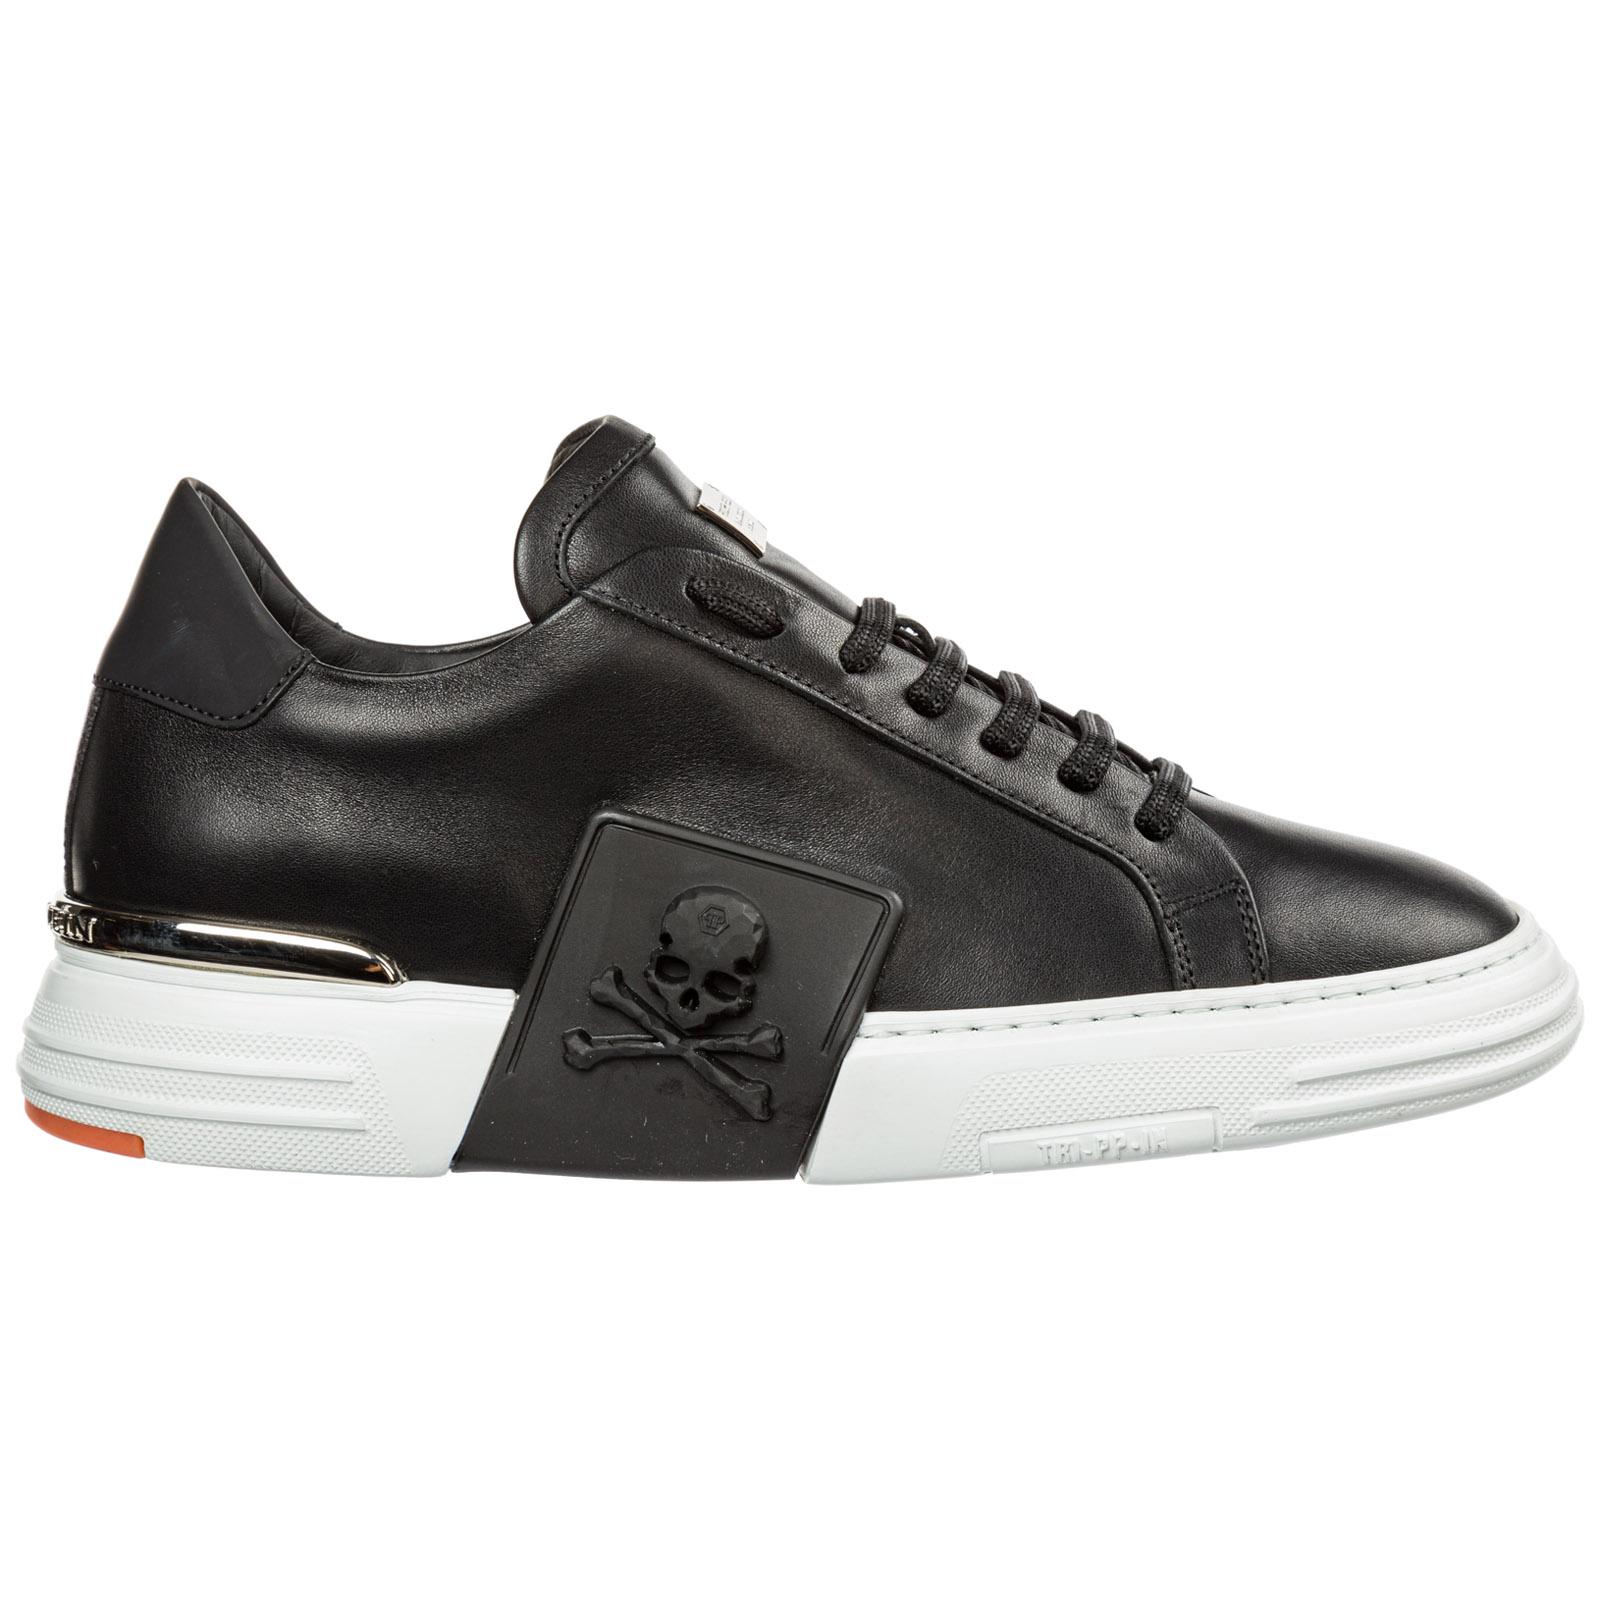 philipp plein mens shoes